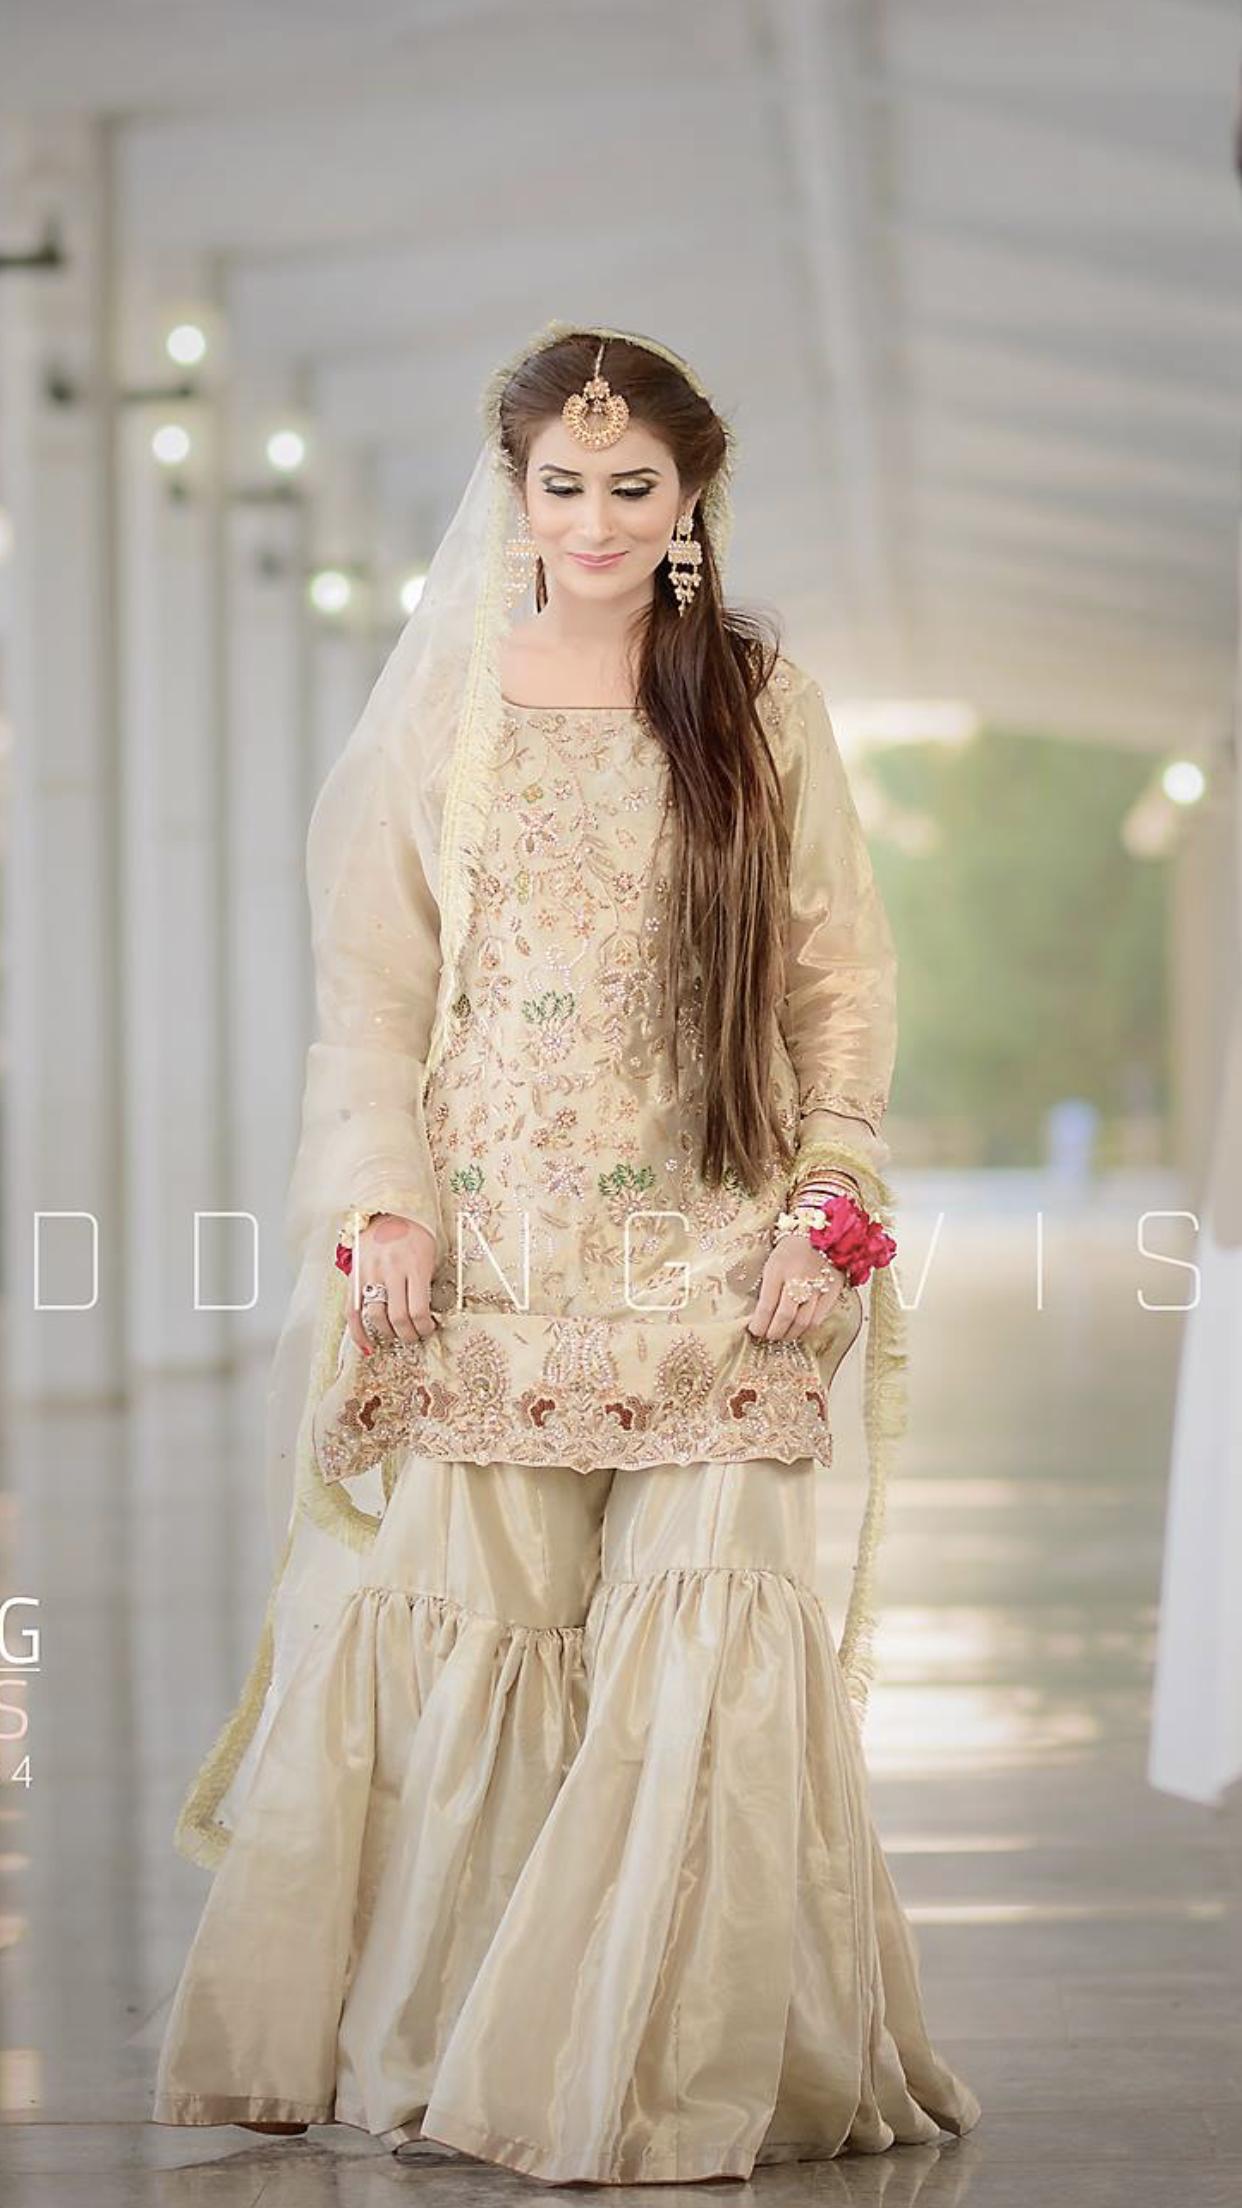 Nikkah Bride Pakistani Bridal Dresses Pakistani Wedding Outfits Stylish Wedding Dresses,Wedding Dresses With Long Trains And Sleeves